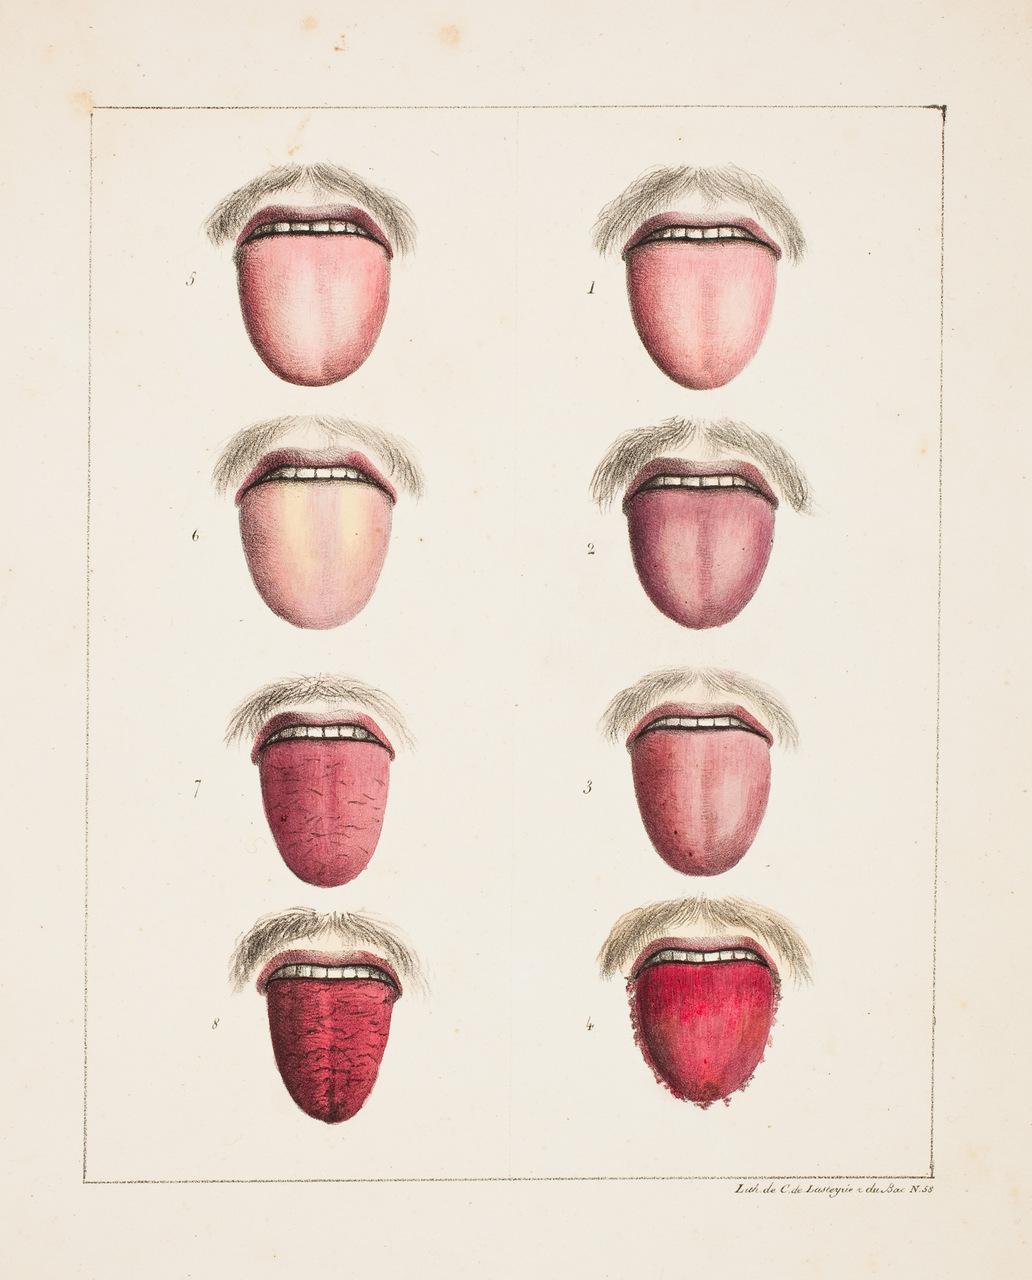 """Observations sur la Fièvre Jaune, faites à Cadix, en 1819"" (litografia sulle manifestazioni facciali della febbre gialla), di Estienne Pariset (1770-1847) e André Mazet (1795-1821)."